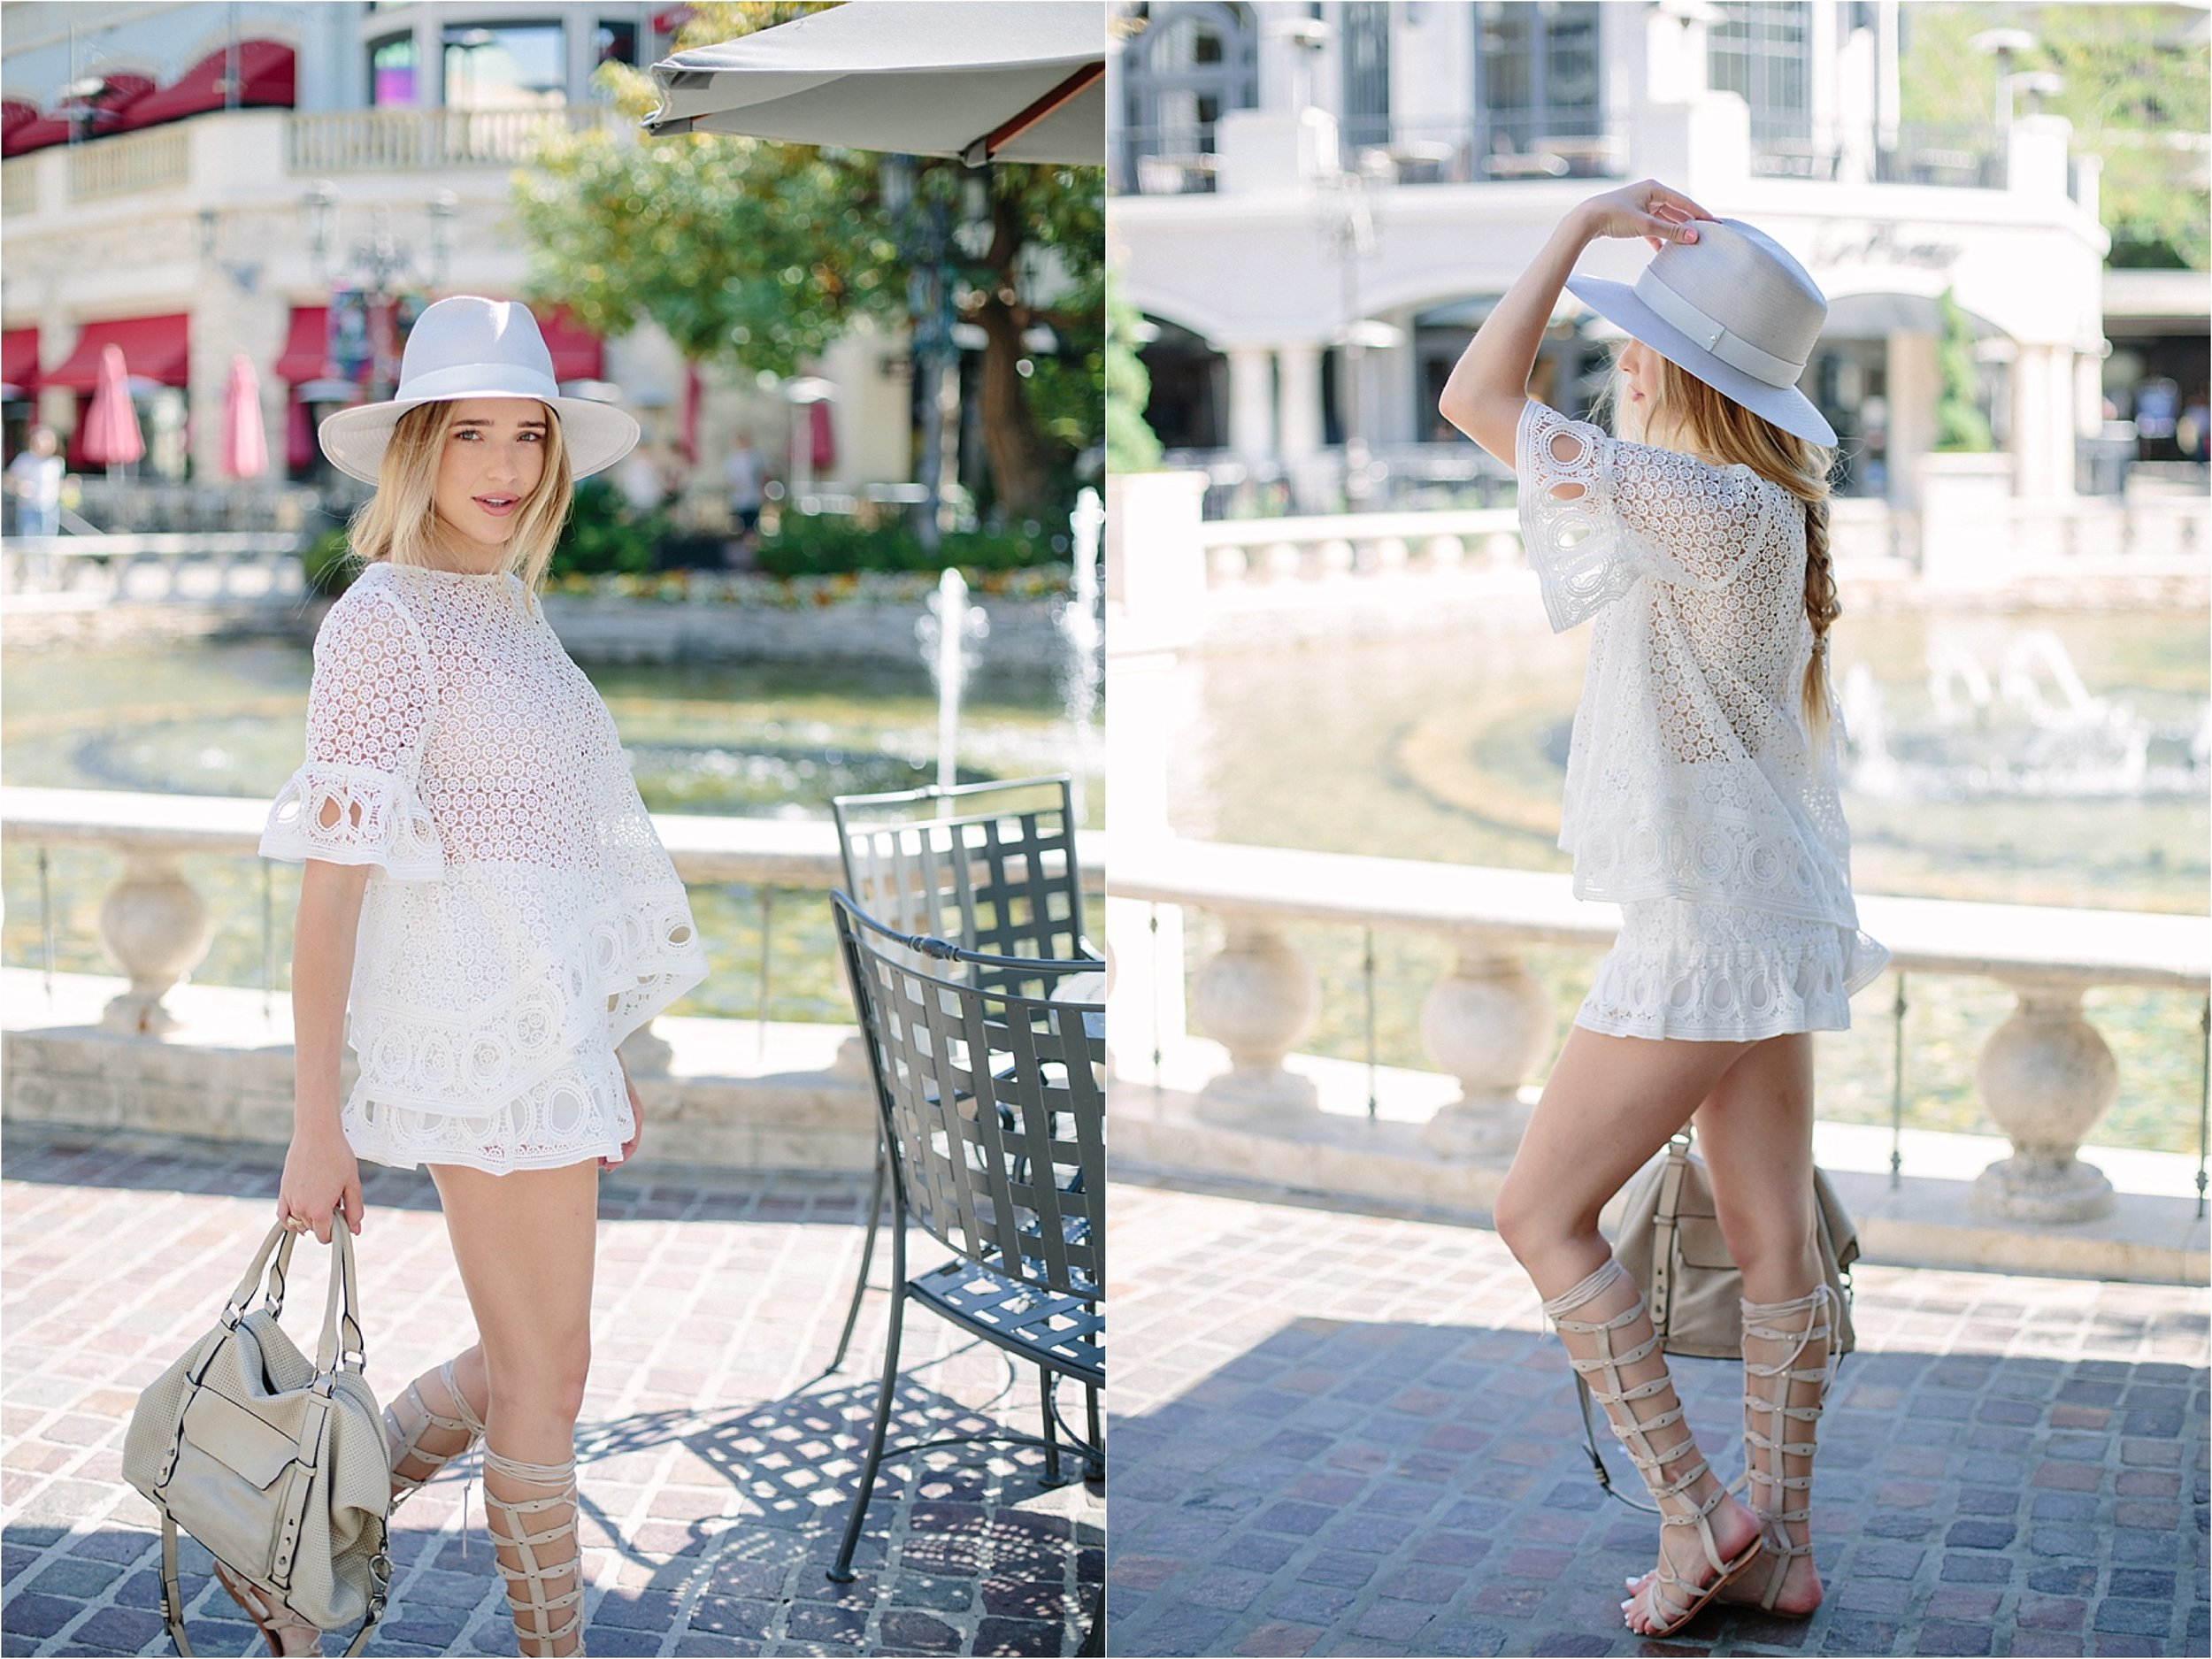 Los Angeles Revolve Fashion Photo